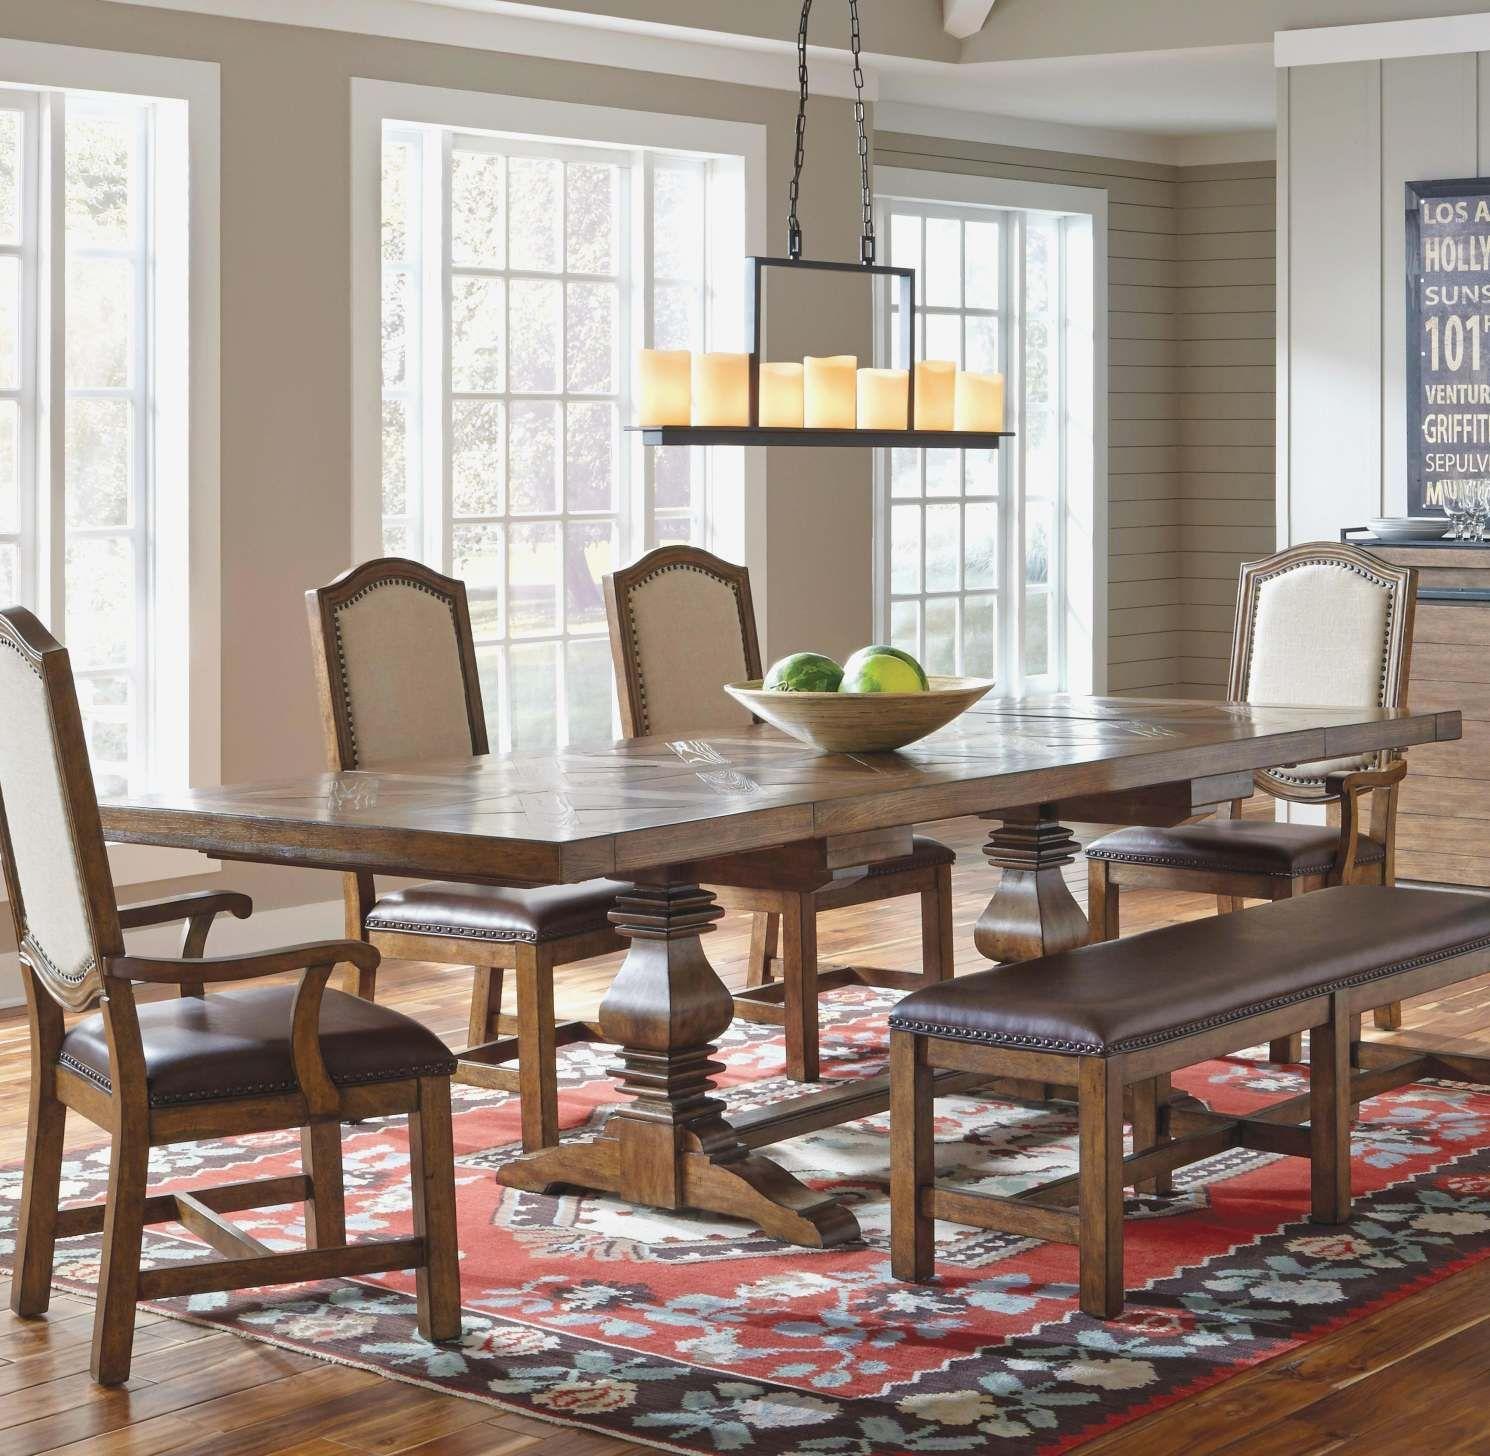 30 Elegant Picture Of Casual Dining Room Decor